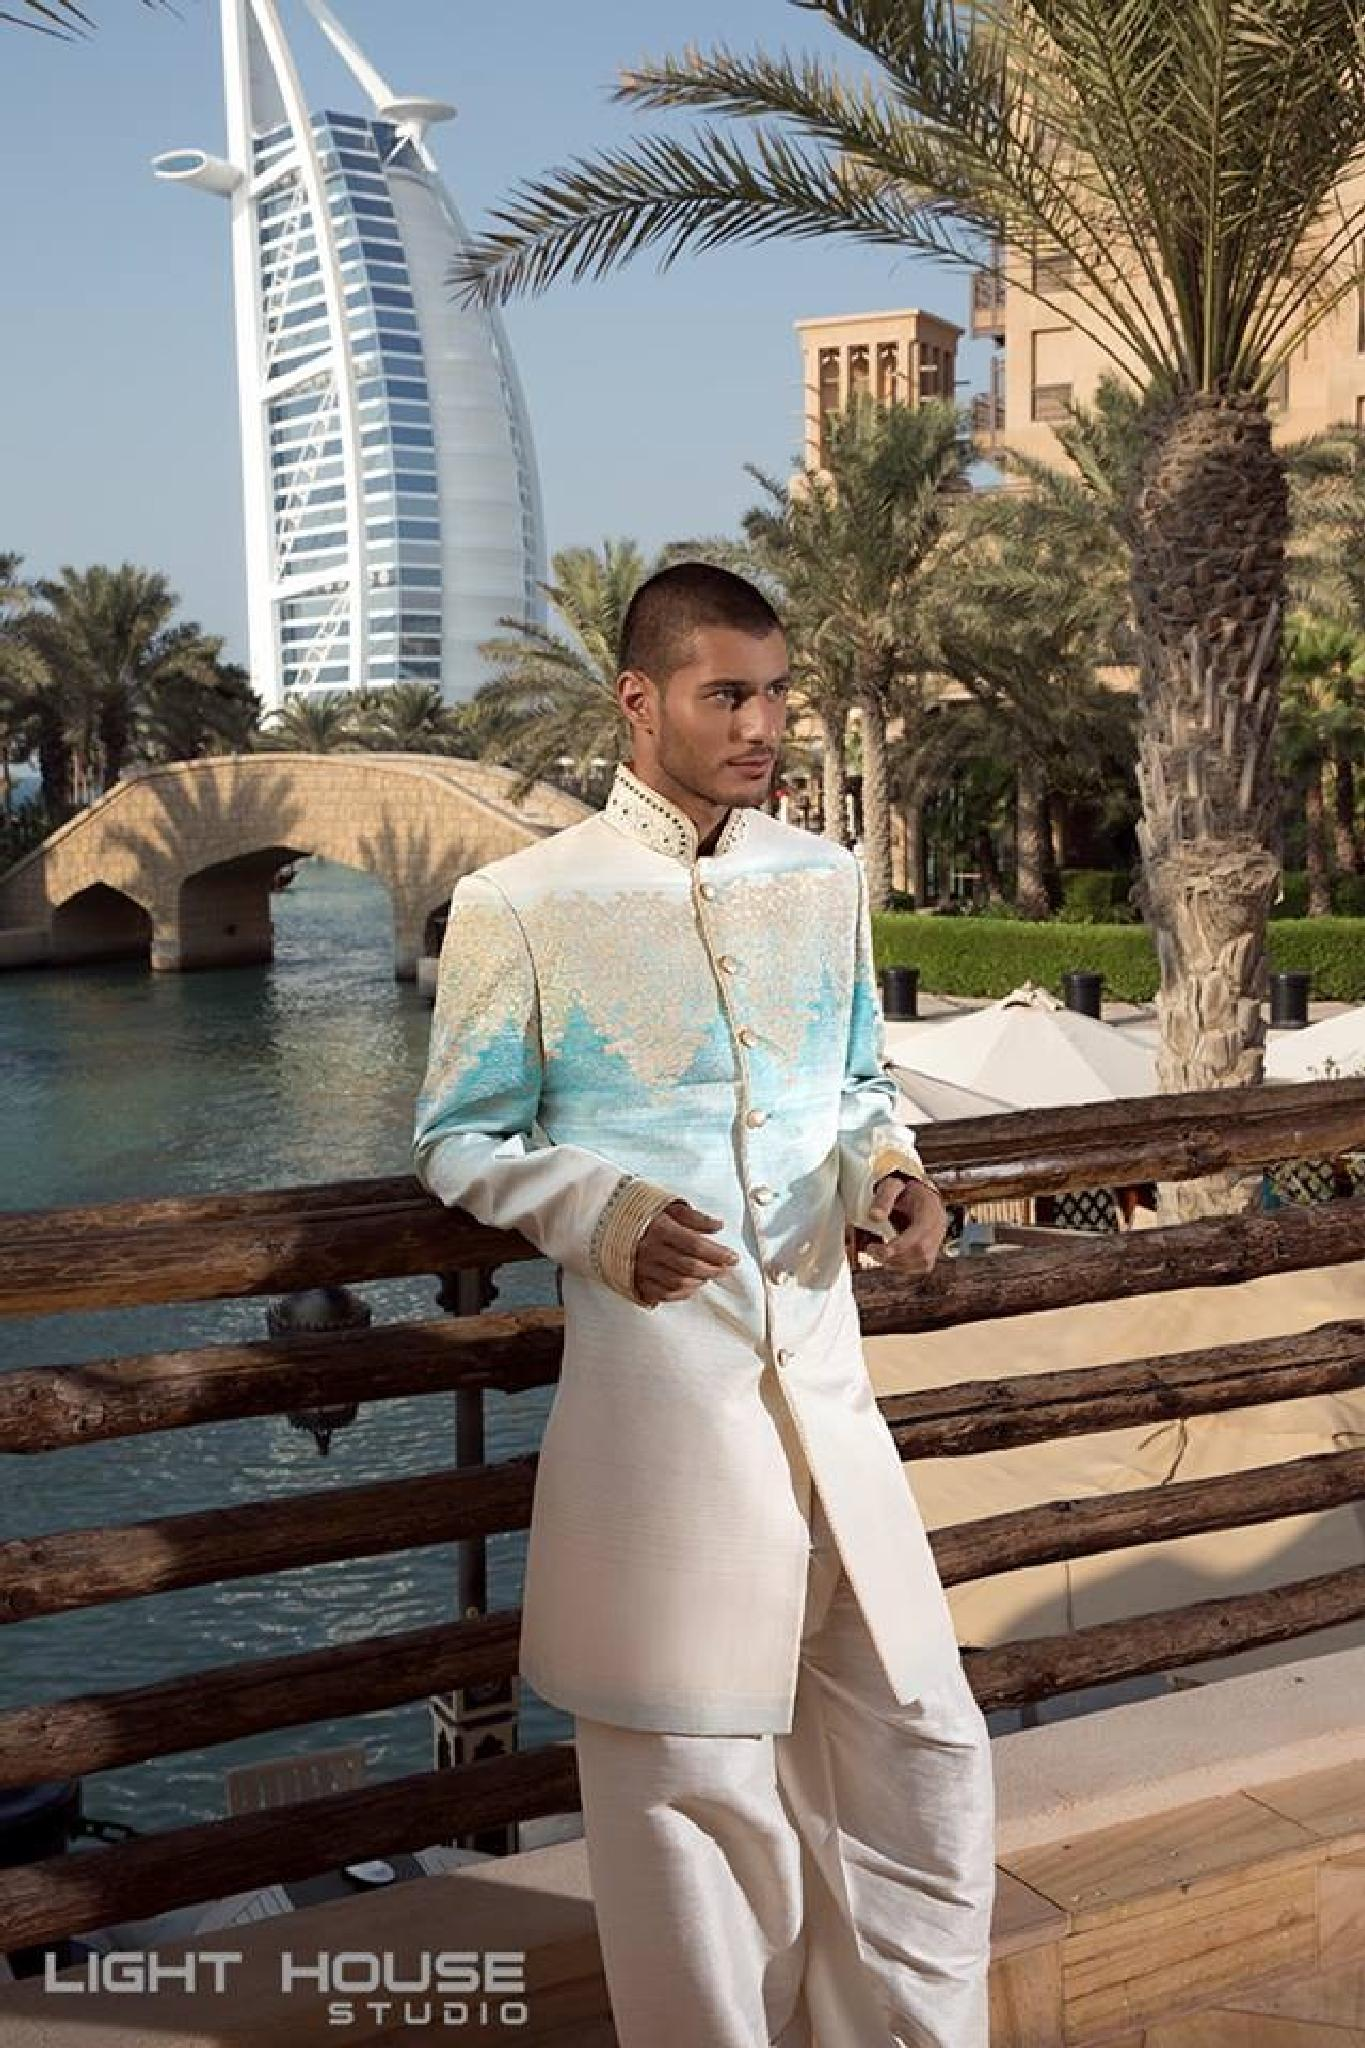 Previous Photoshoot for Millionaire clothing  by Light House Studio Dubai